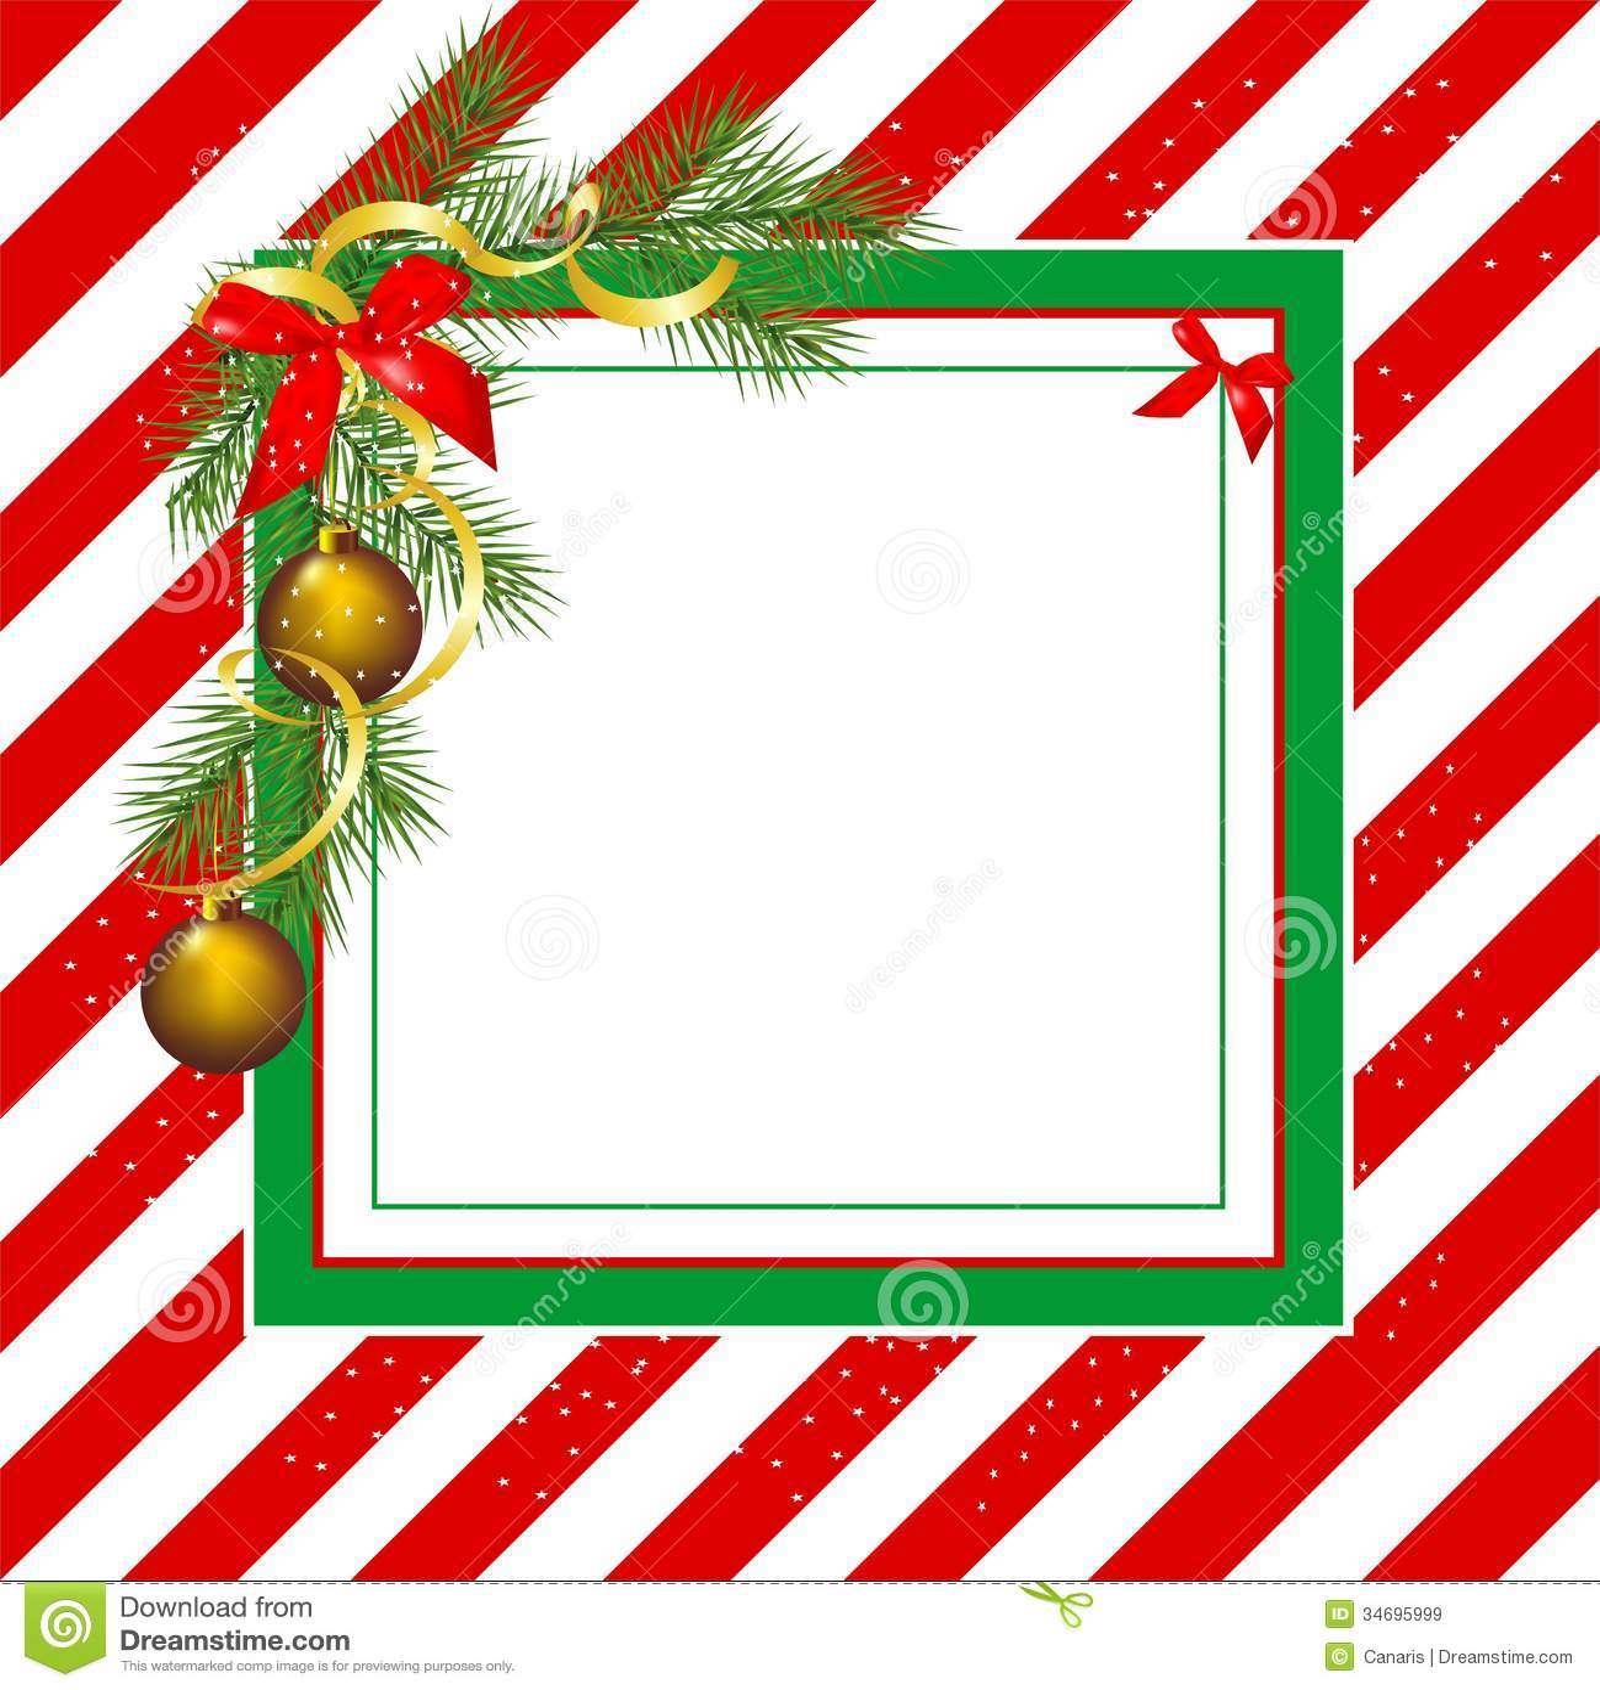 Christmas frame stock illustration. Illustration of seasonal - 34695999